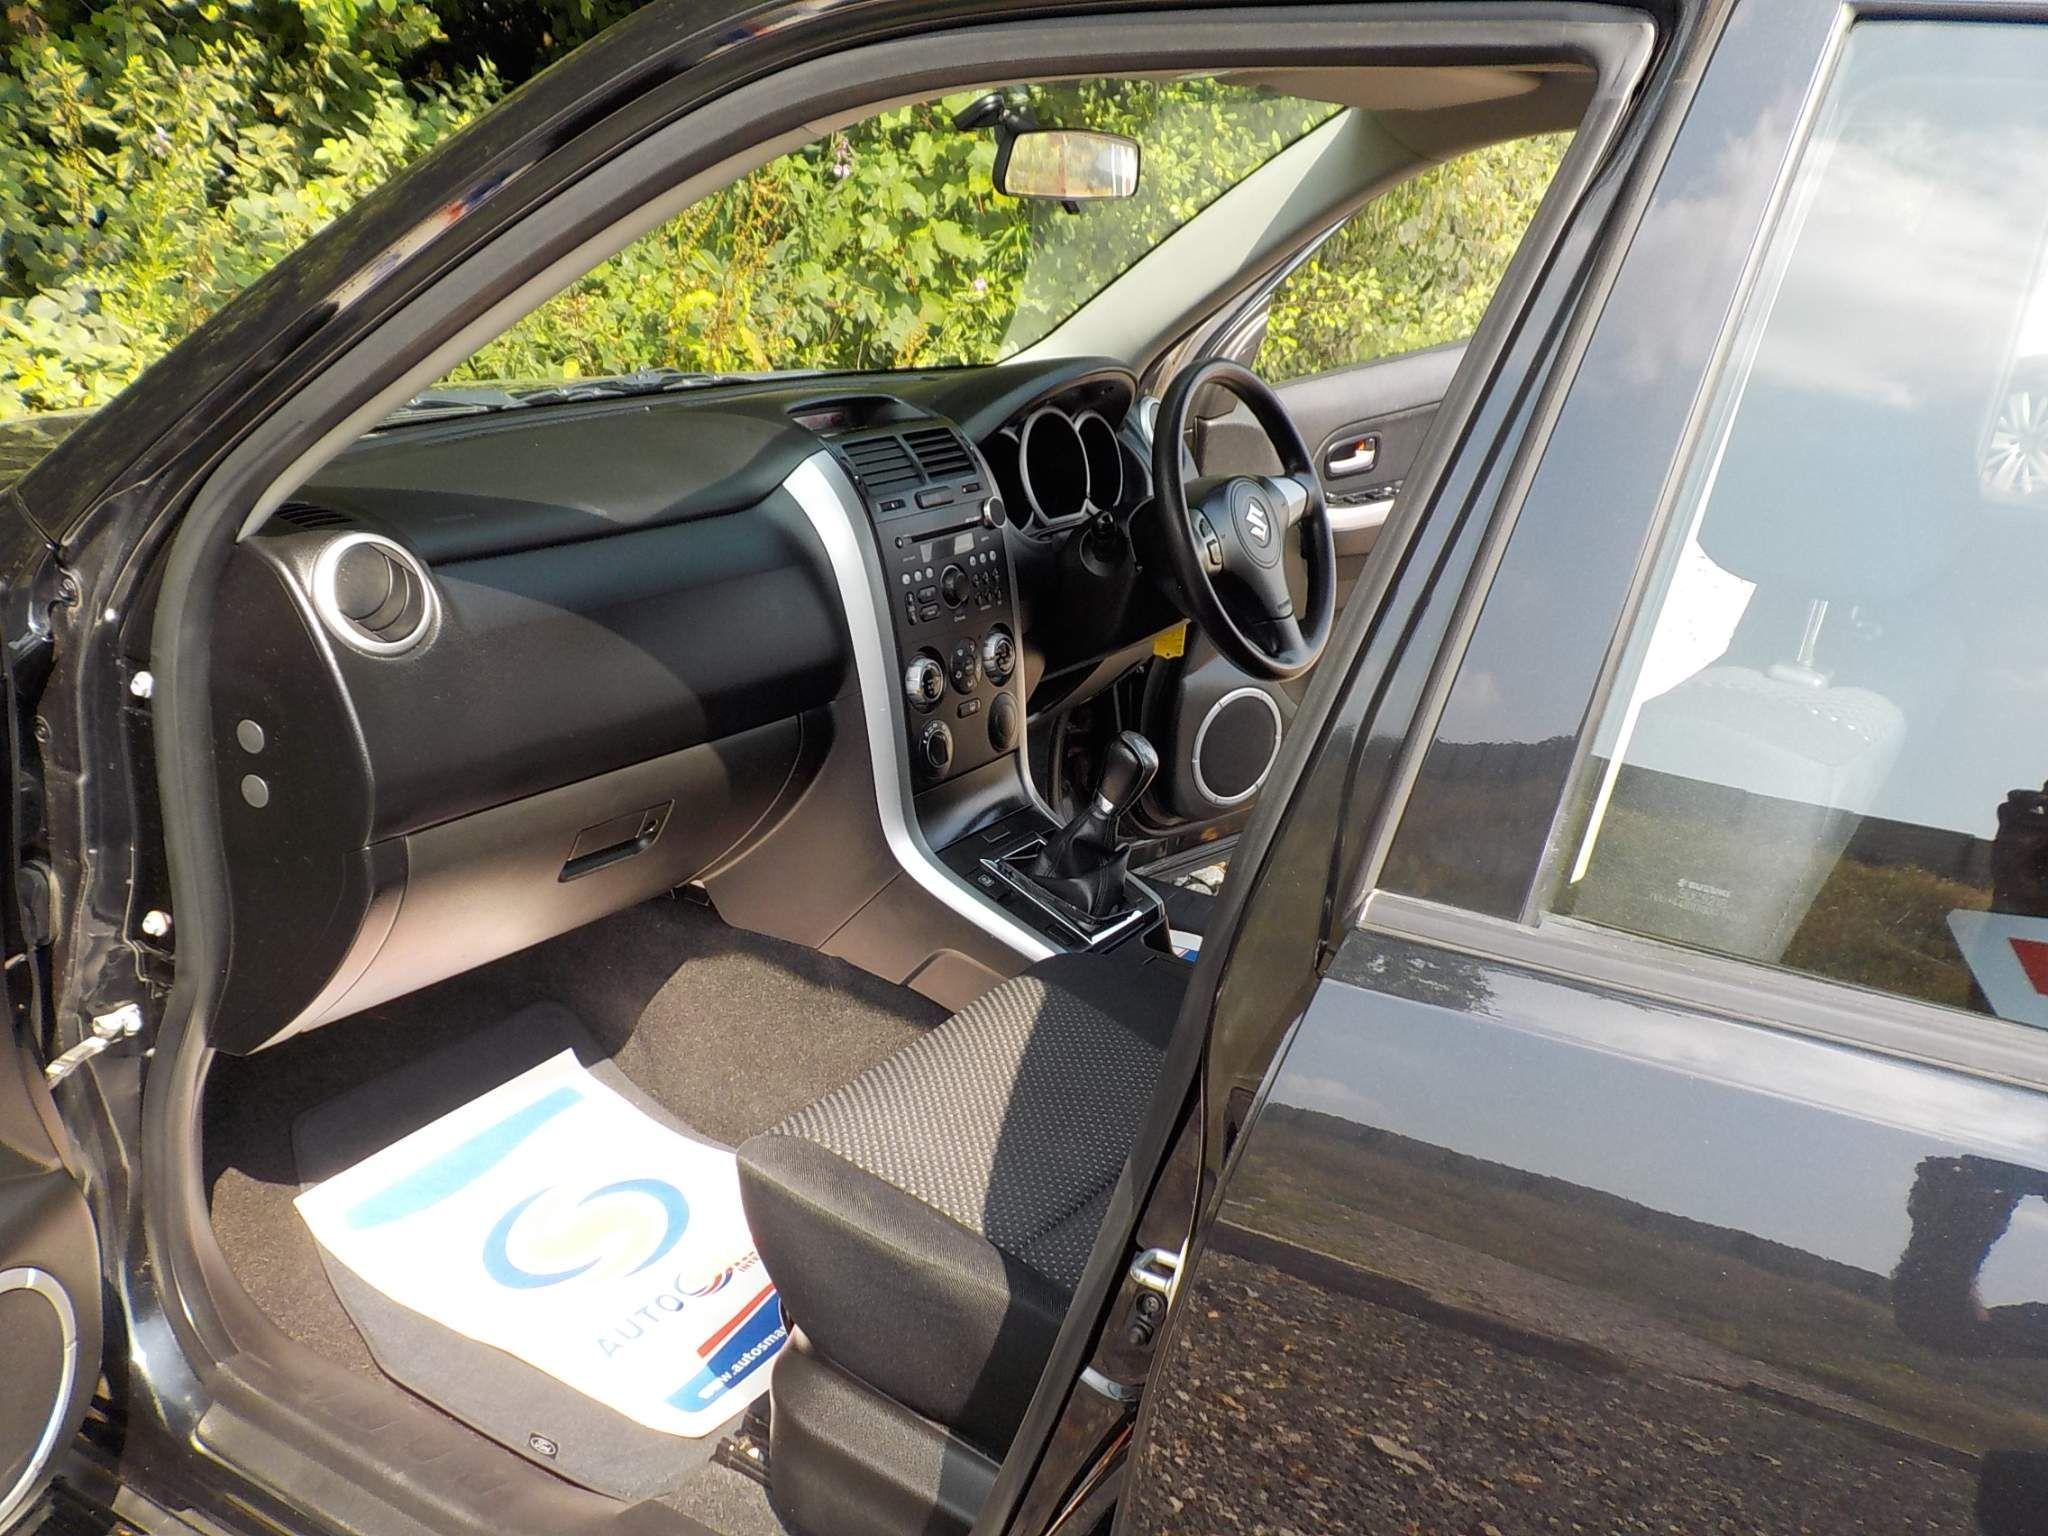 Suzuki Grand Vitara 1.9 DDiS X-EC 5dr